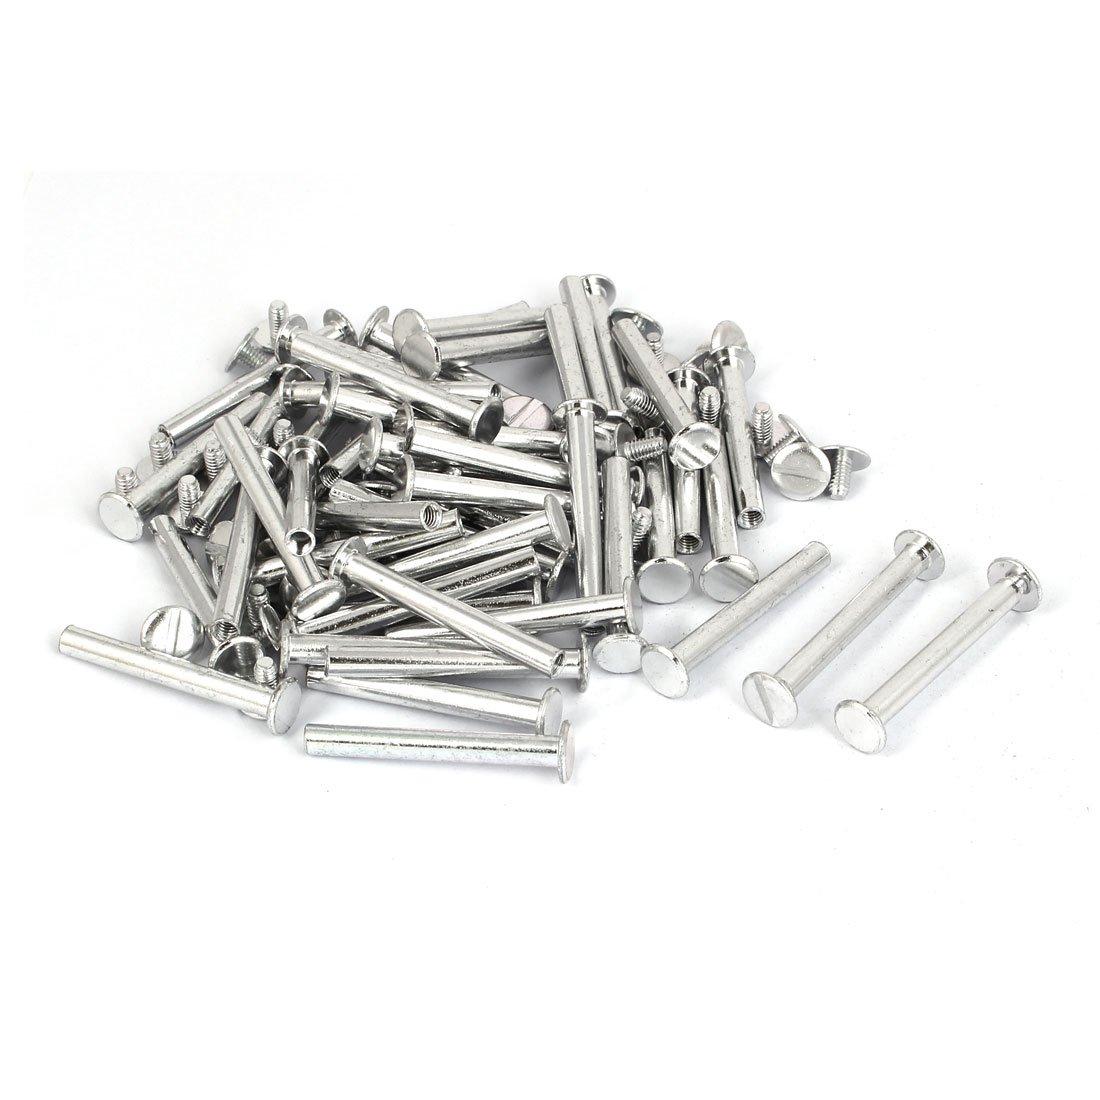 uxcell M5x40mm Photo Albums Scrapbook Aluminum Binding Screw Post Silver Tone 50 Pcs